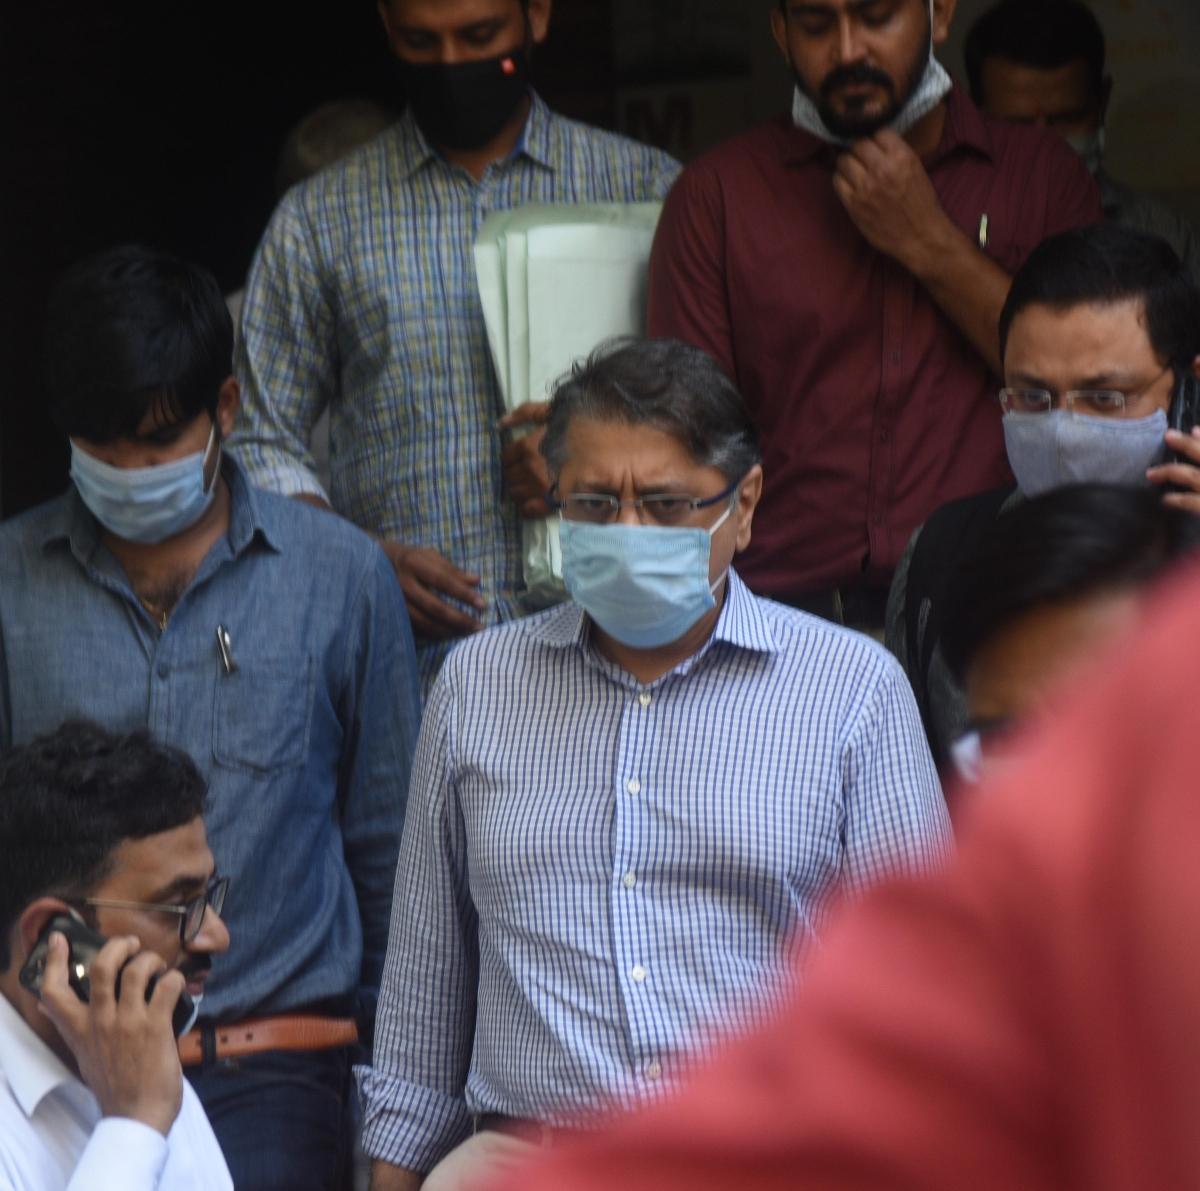 ICICI-Videocon case: Deepak Kochhar sent to ED custody till 19 Sept; agency says he's not cooperating